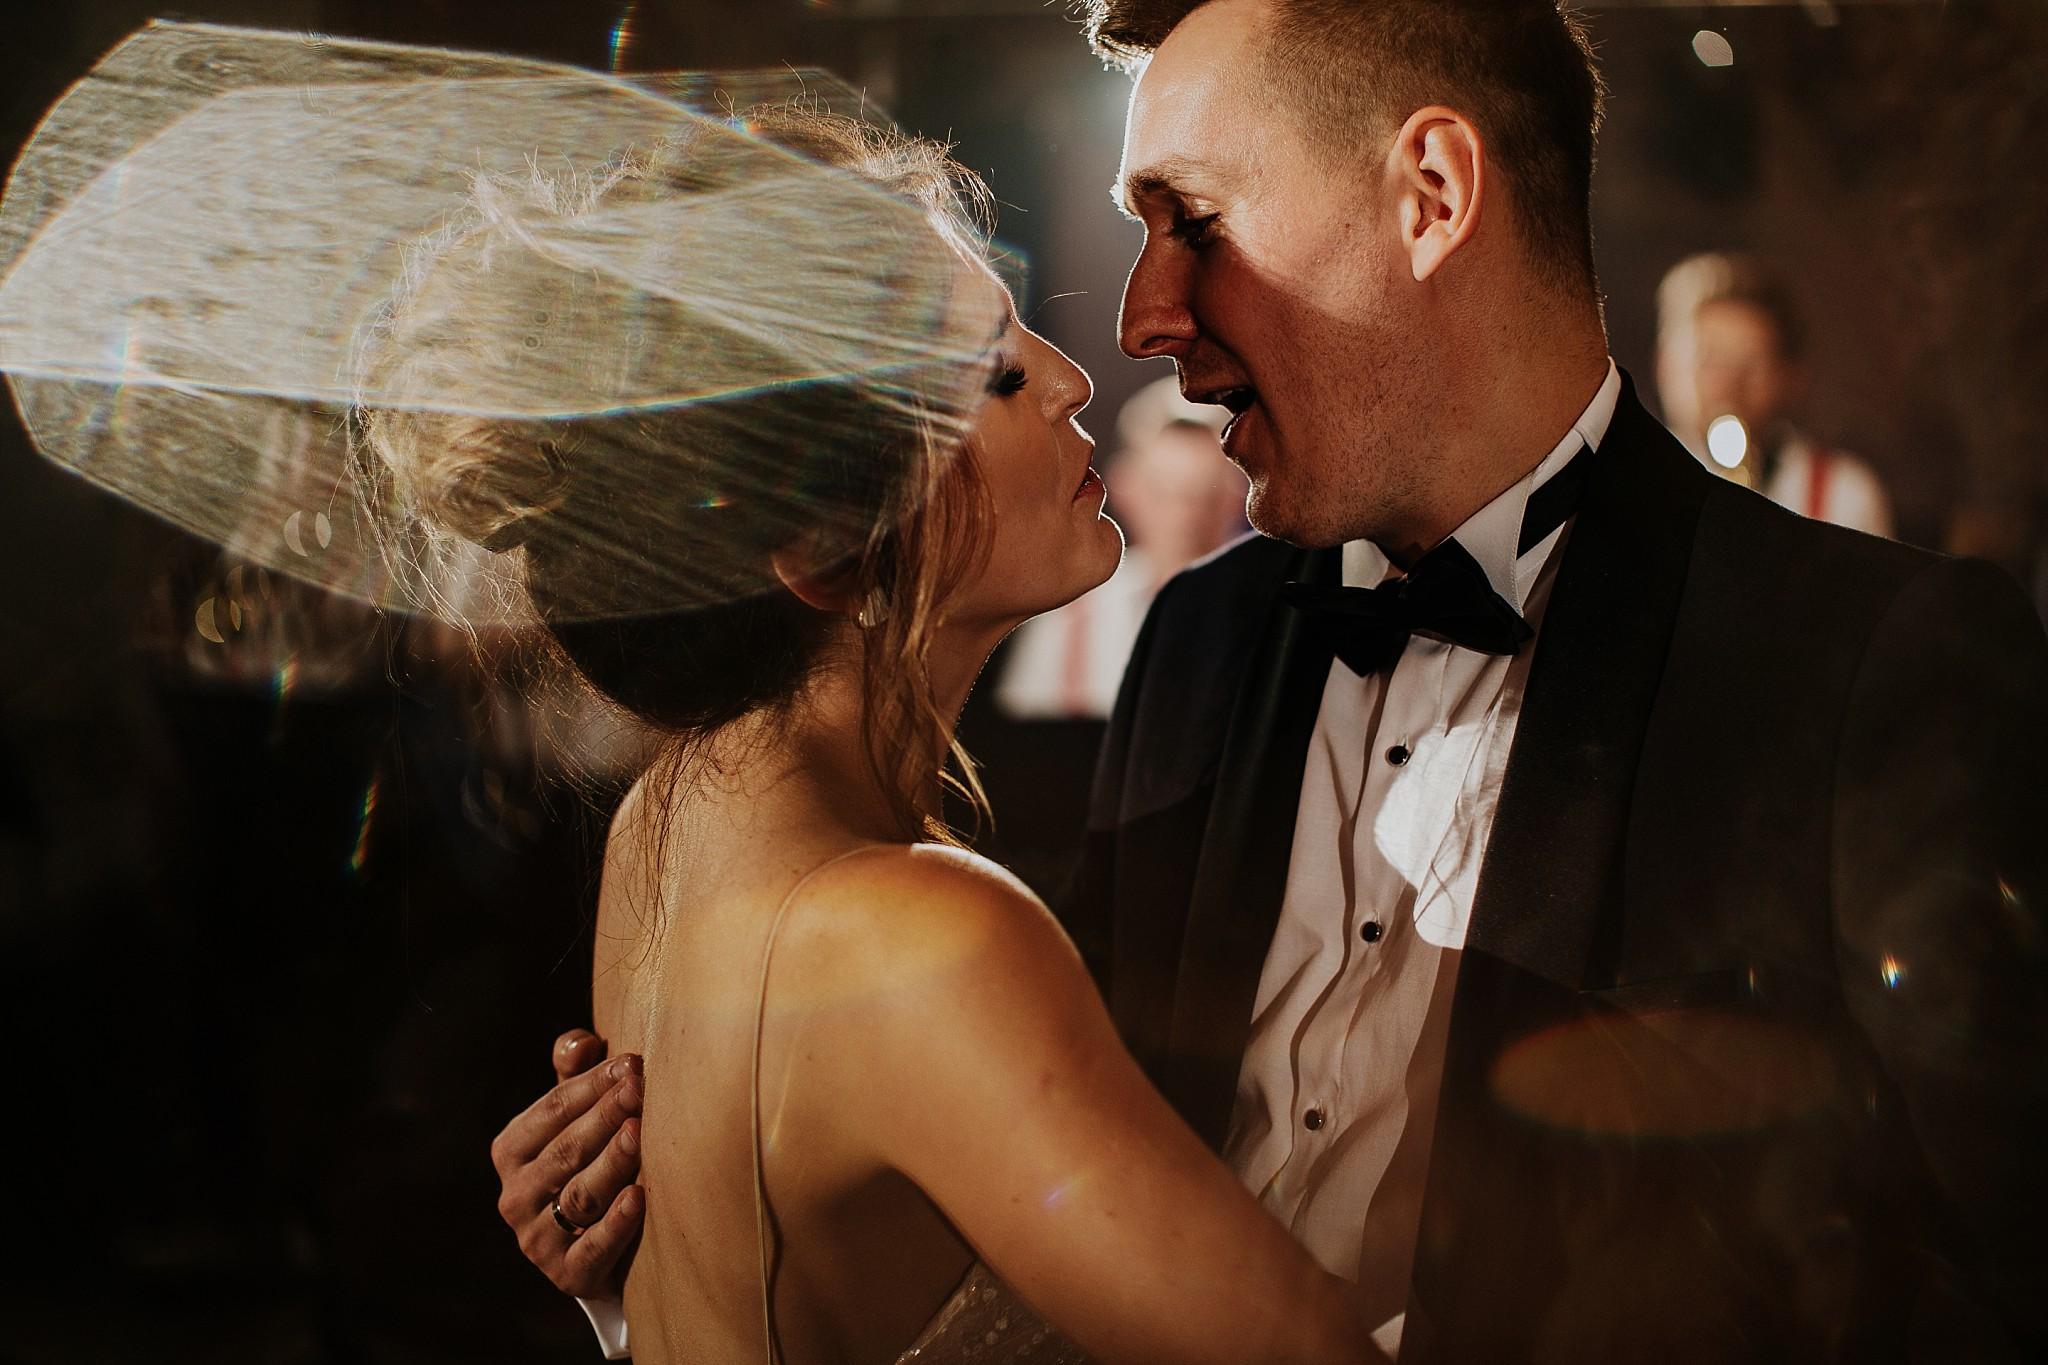 fotograf poznan wesele dobra truskawka piekne wesele pod poznaniem wesele w dobrej truskawce piekna para mloda slub marzen slub koronawirus slub listopad wesele koronawirus 463